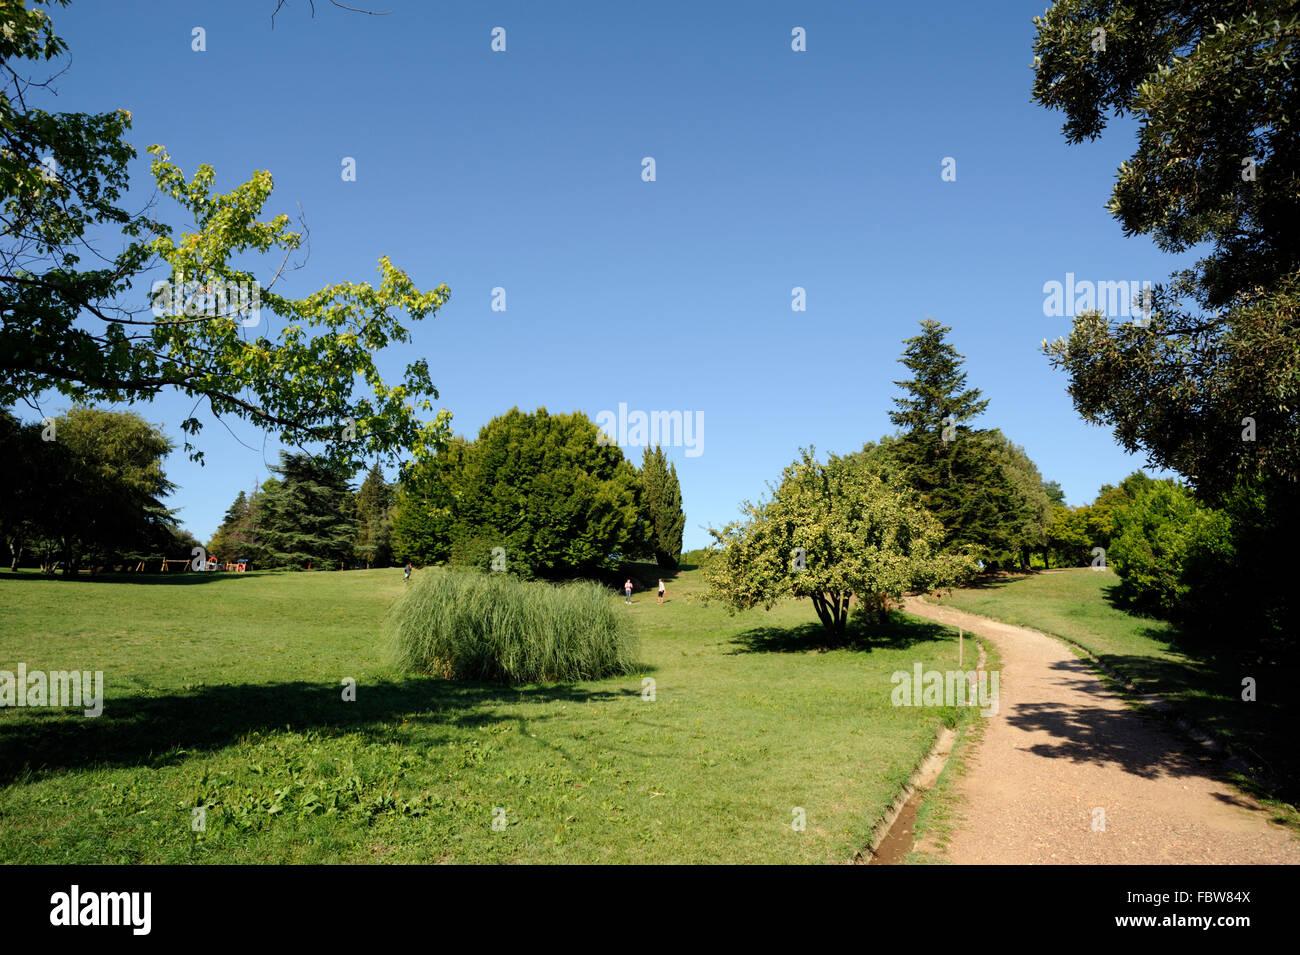 Parco di Castello, park, volterra, tuscany, italy - Stock Image